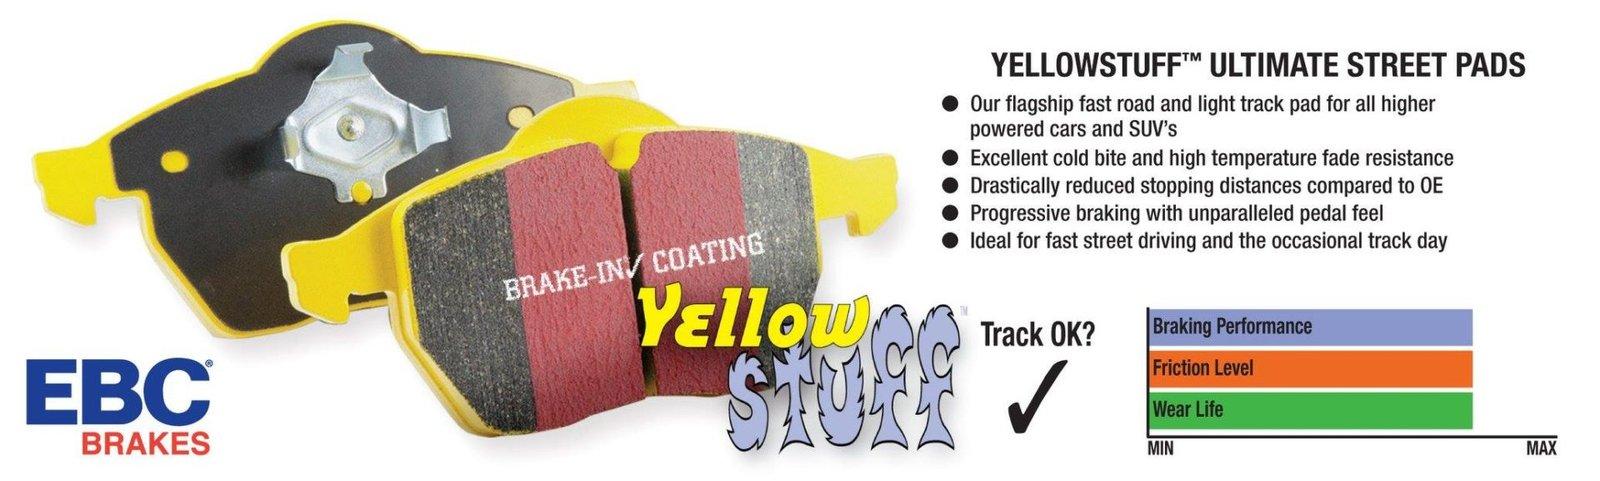 EBC Yellowstuff Pads Via TrackRecon